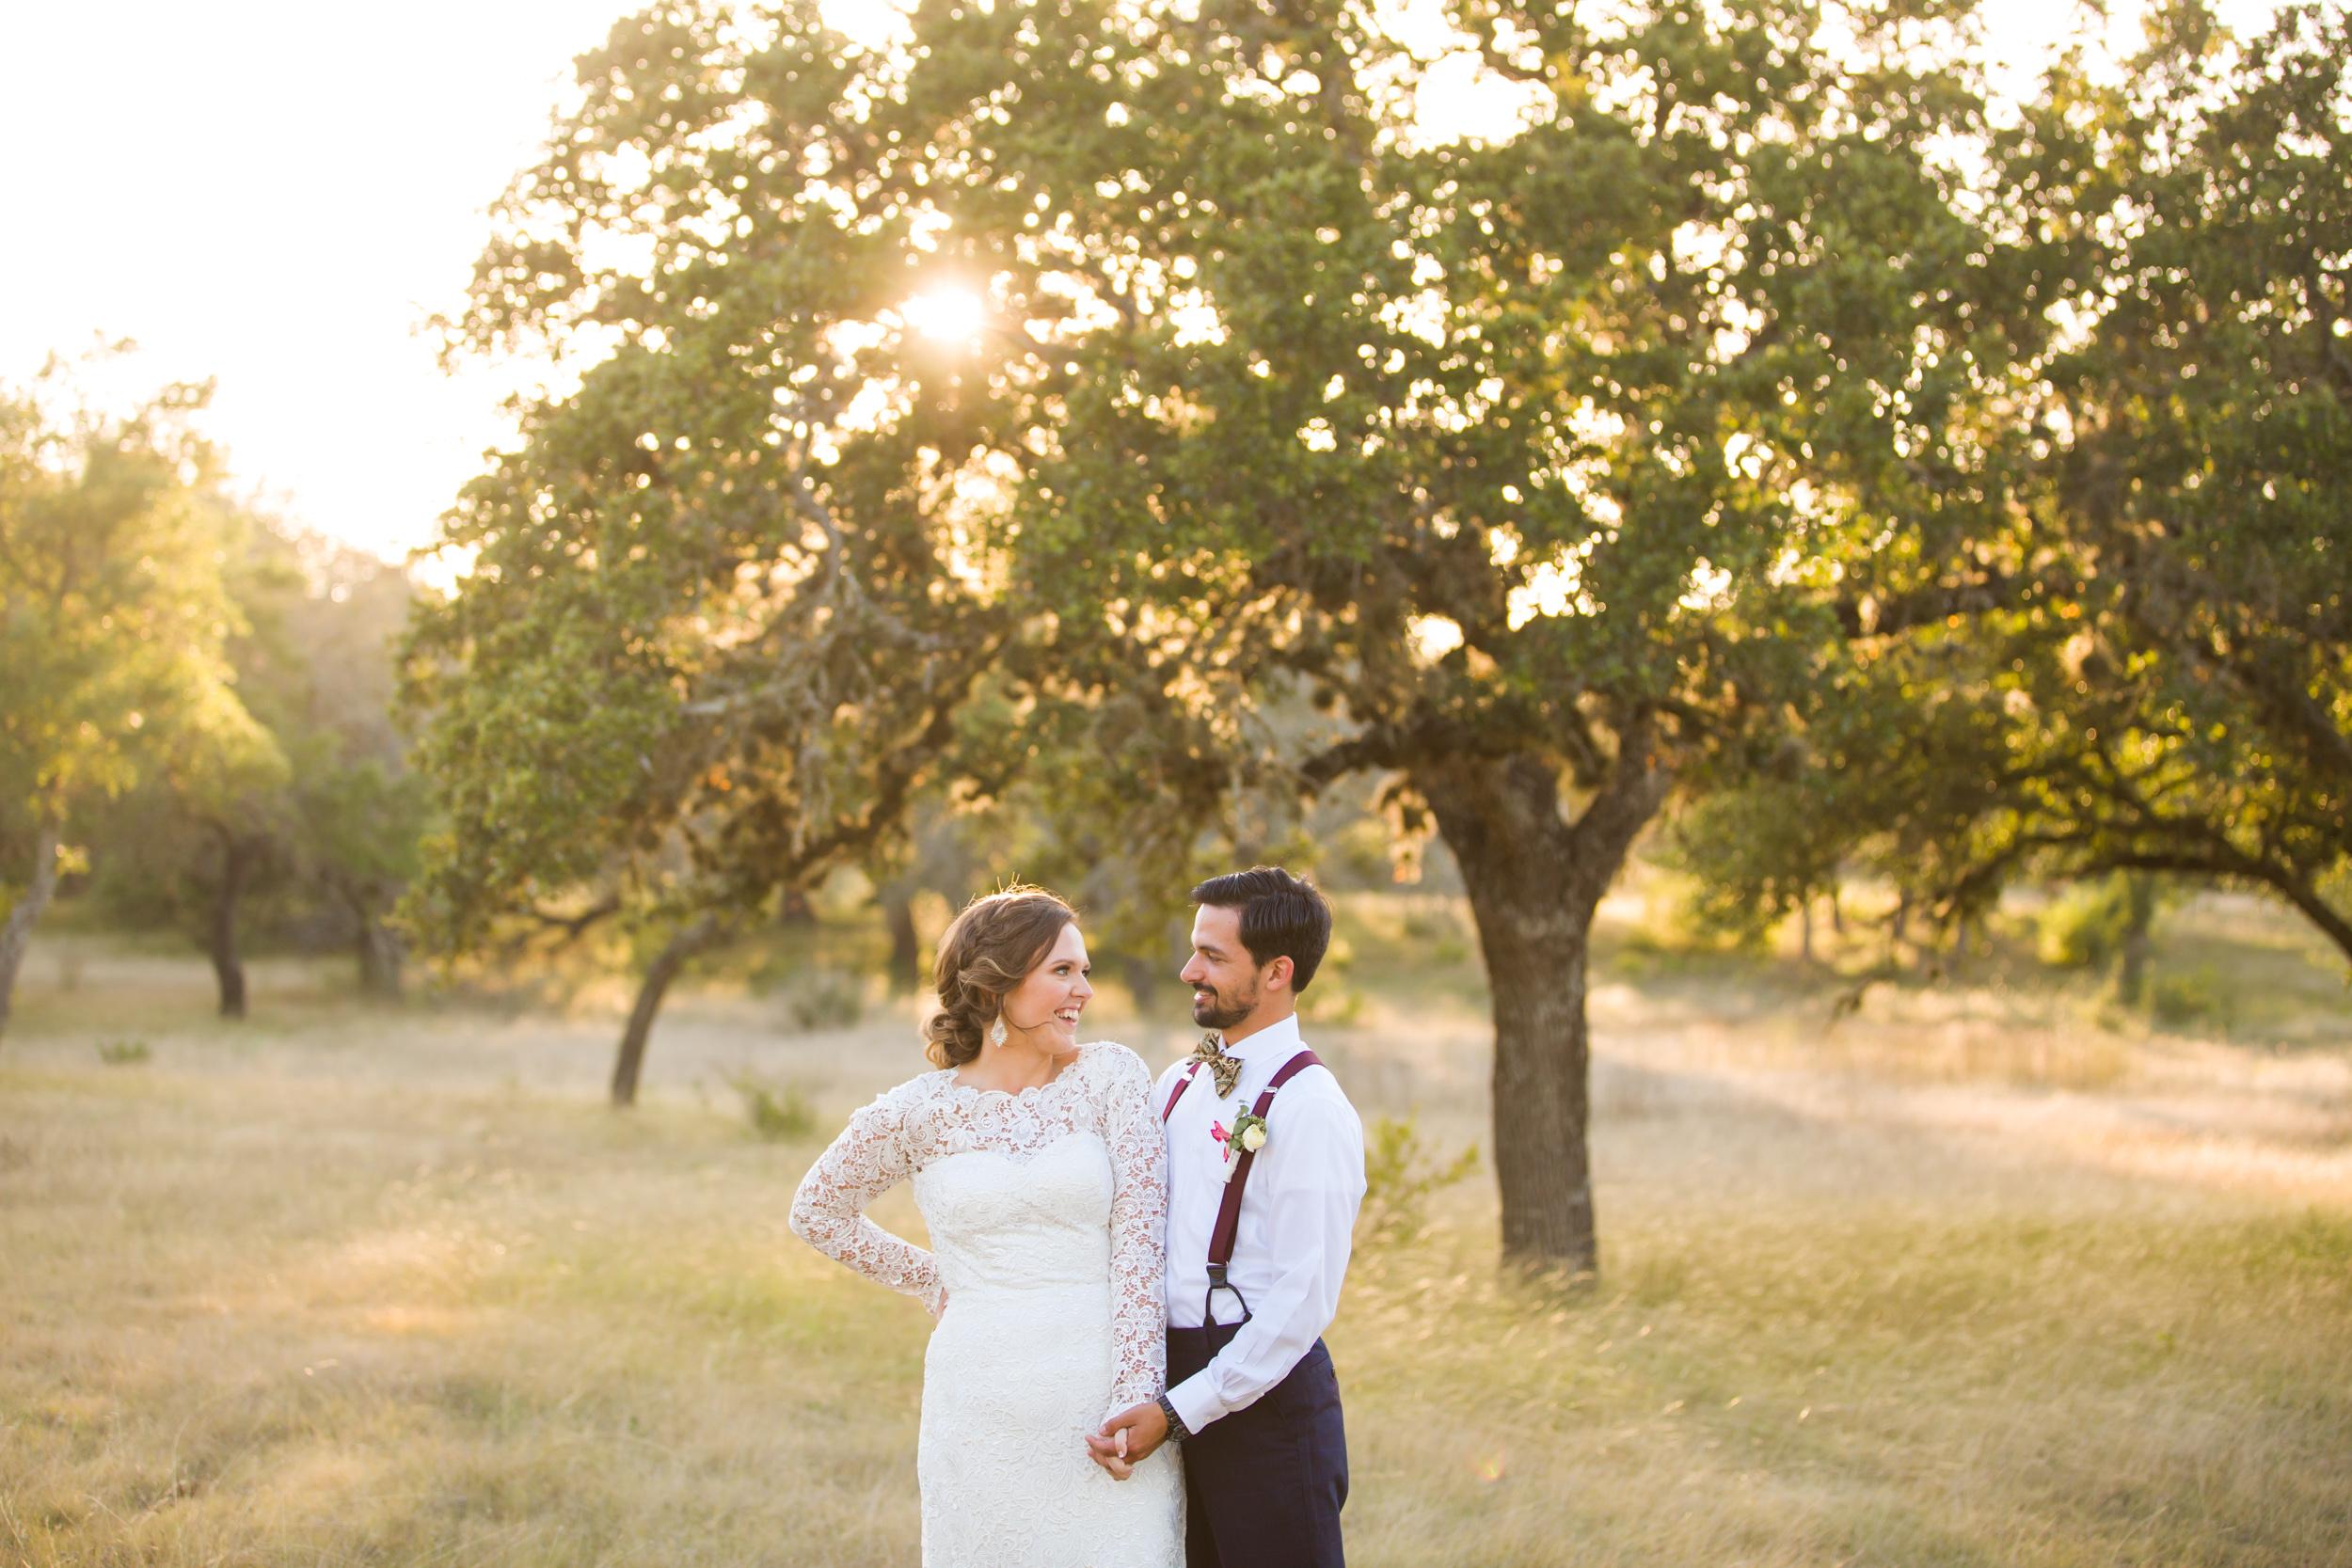 austin-wedding-colorful-39.jpg